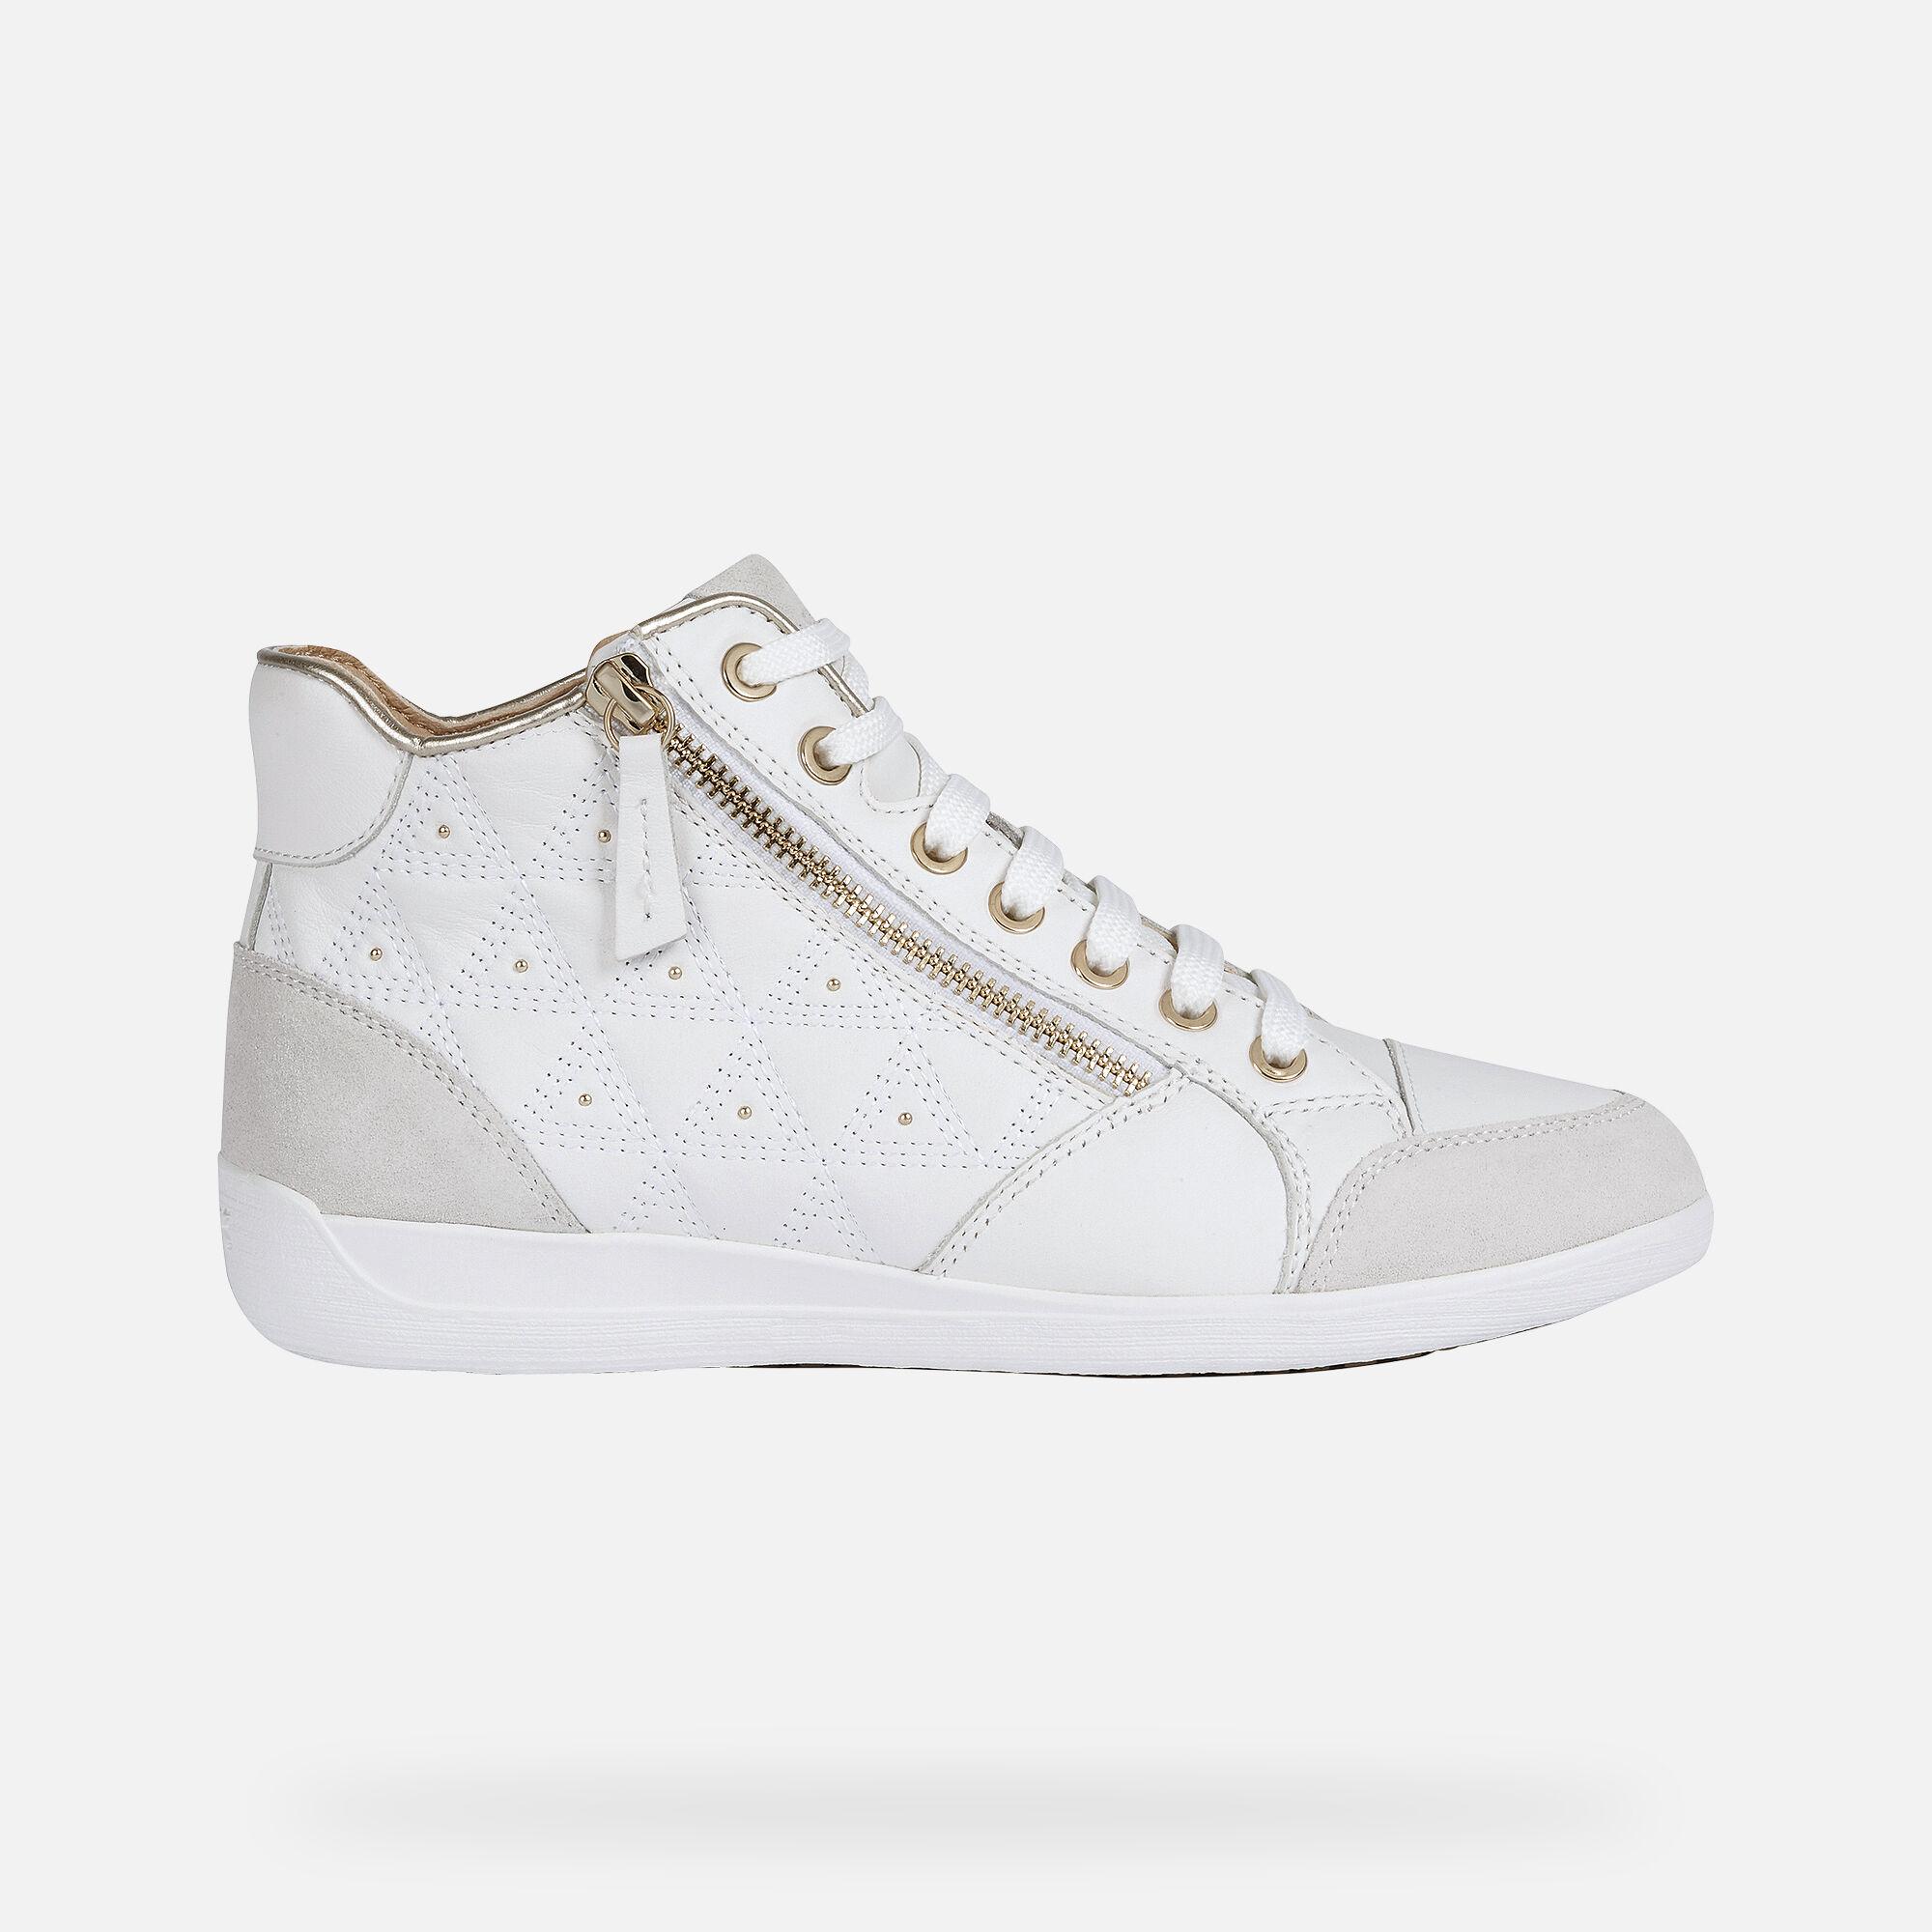 Geox MYRIA Woman: White Sneakers   Geox